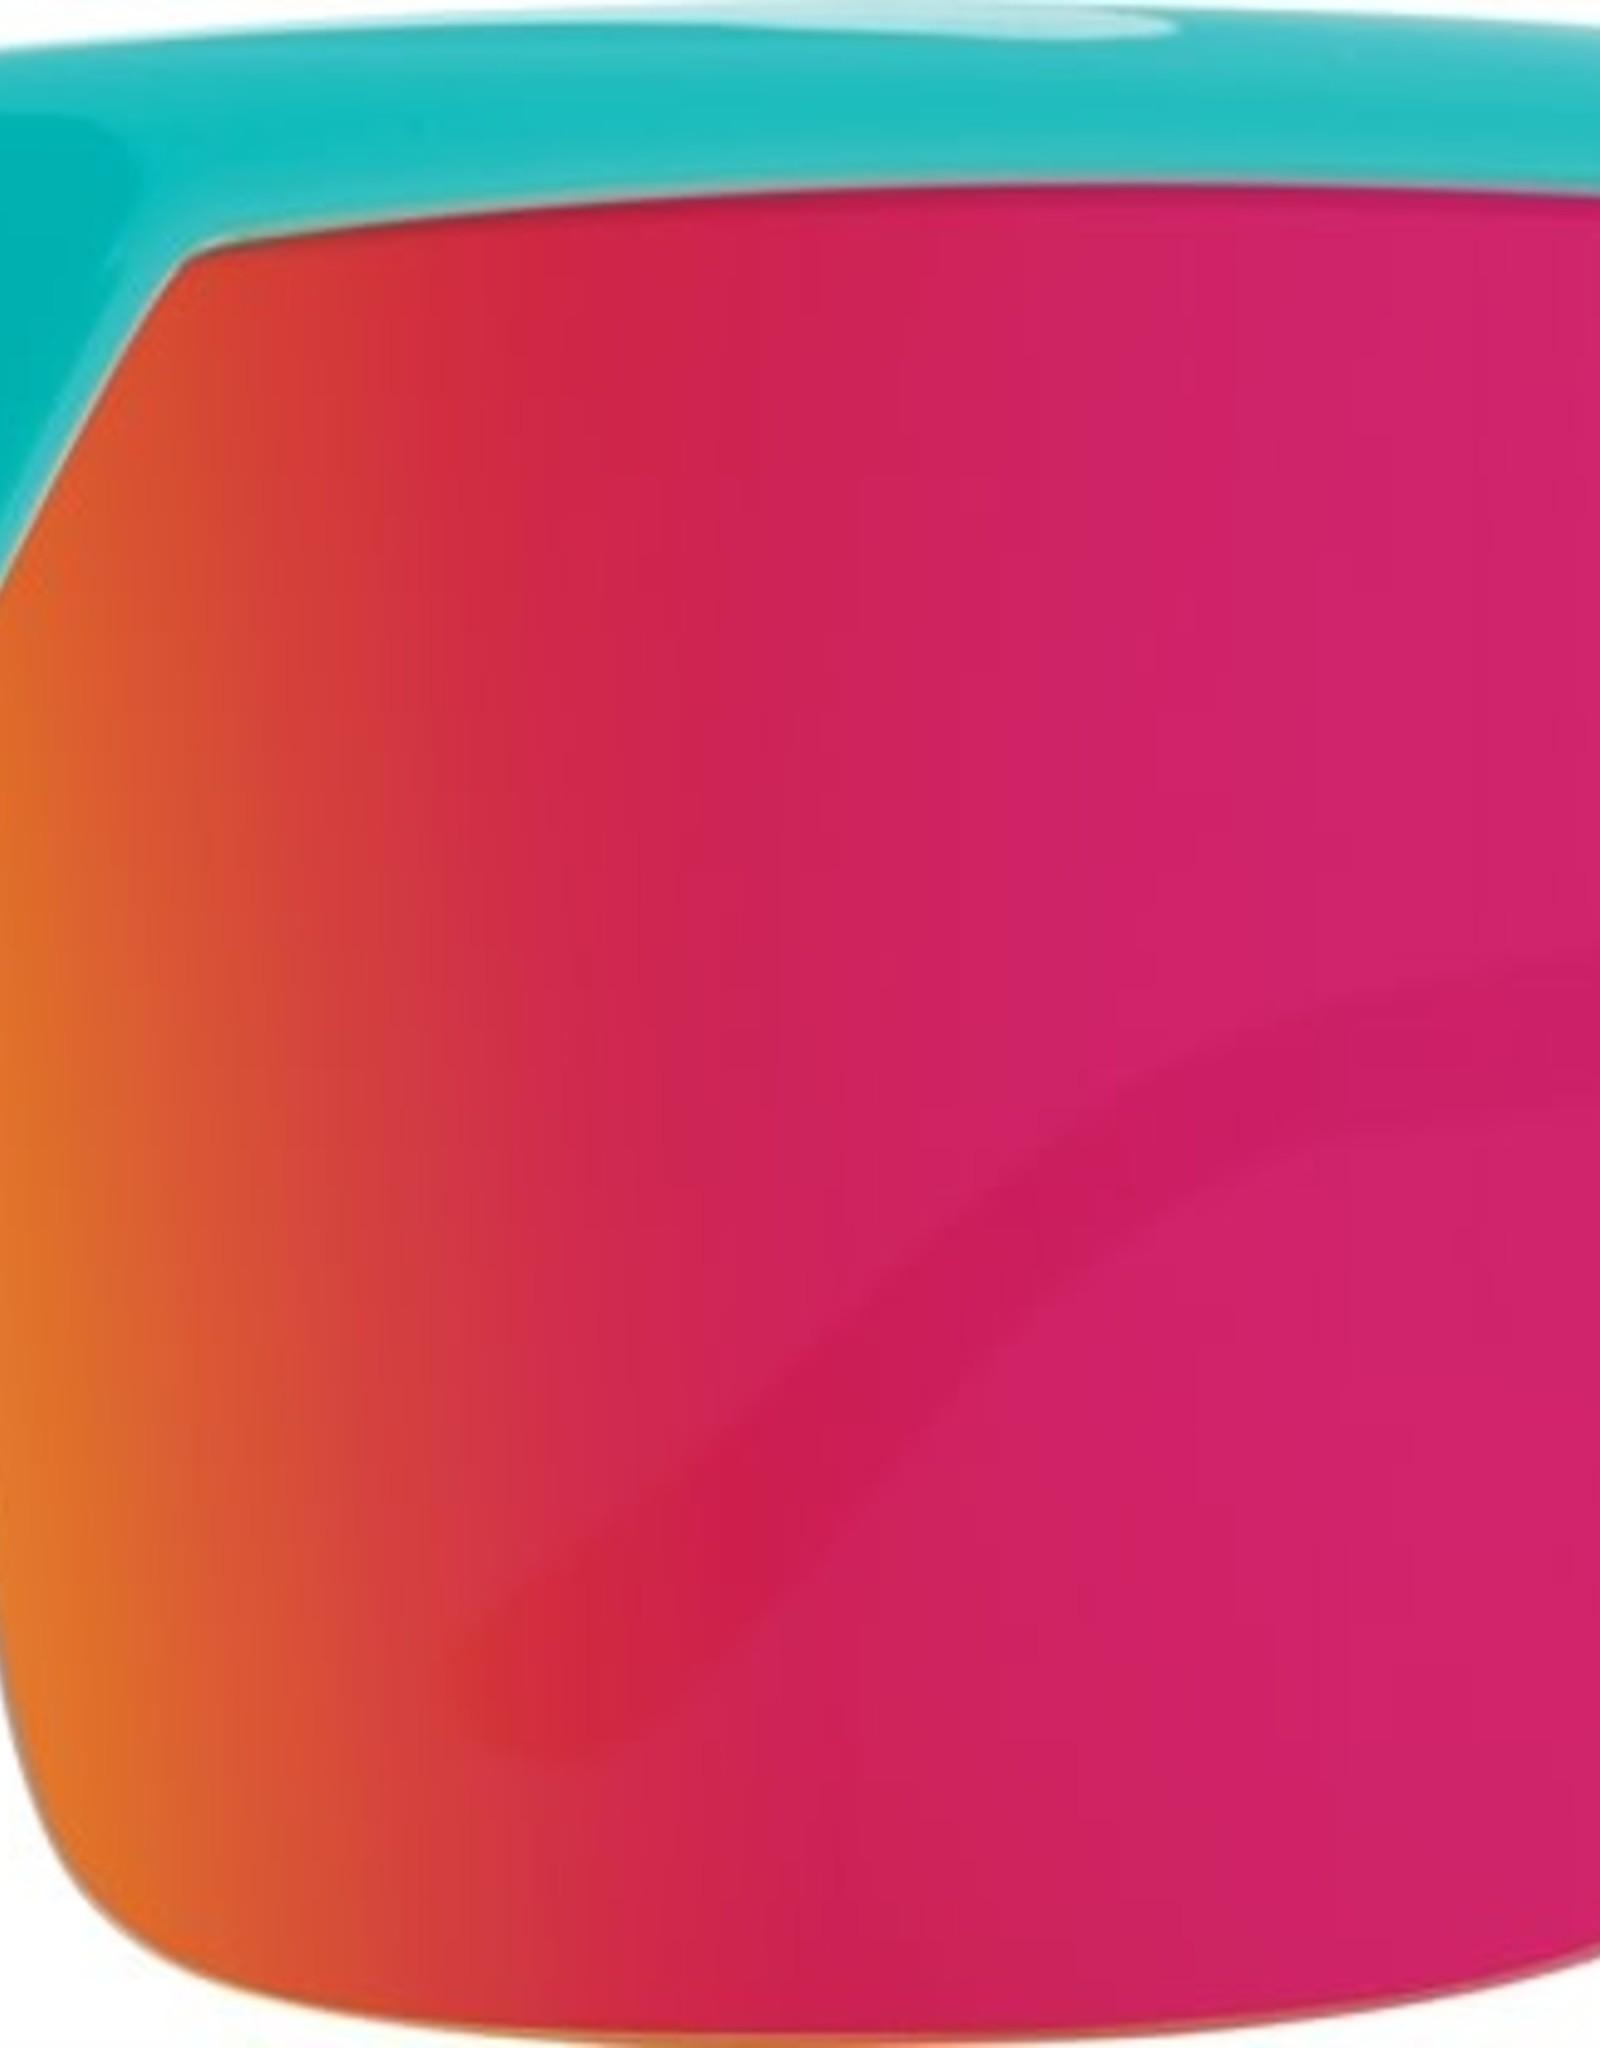 SPY Flynn 5050 Tealhdplus gray grn w/ pink spectra mirror